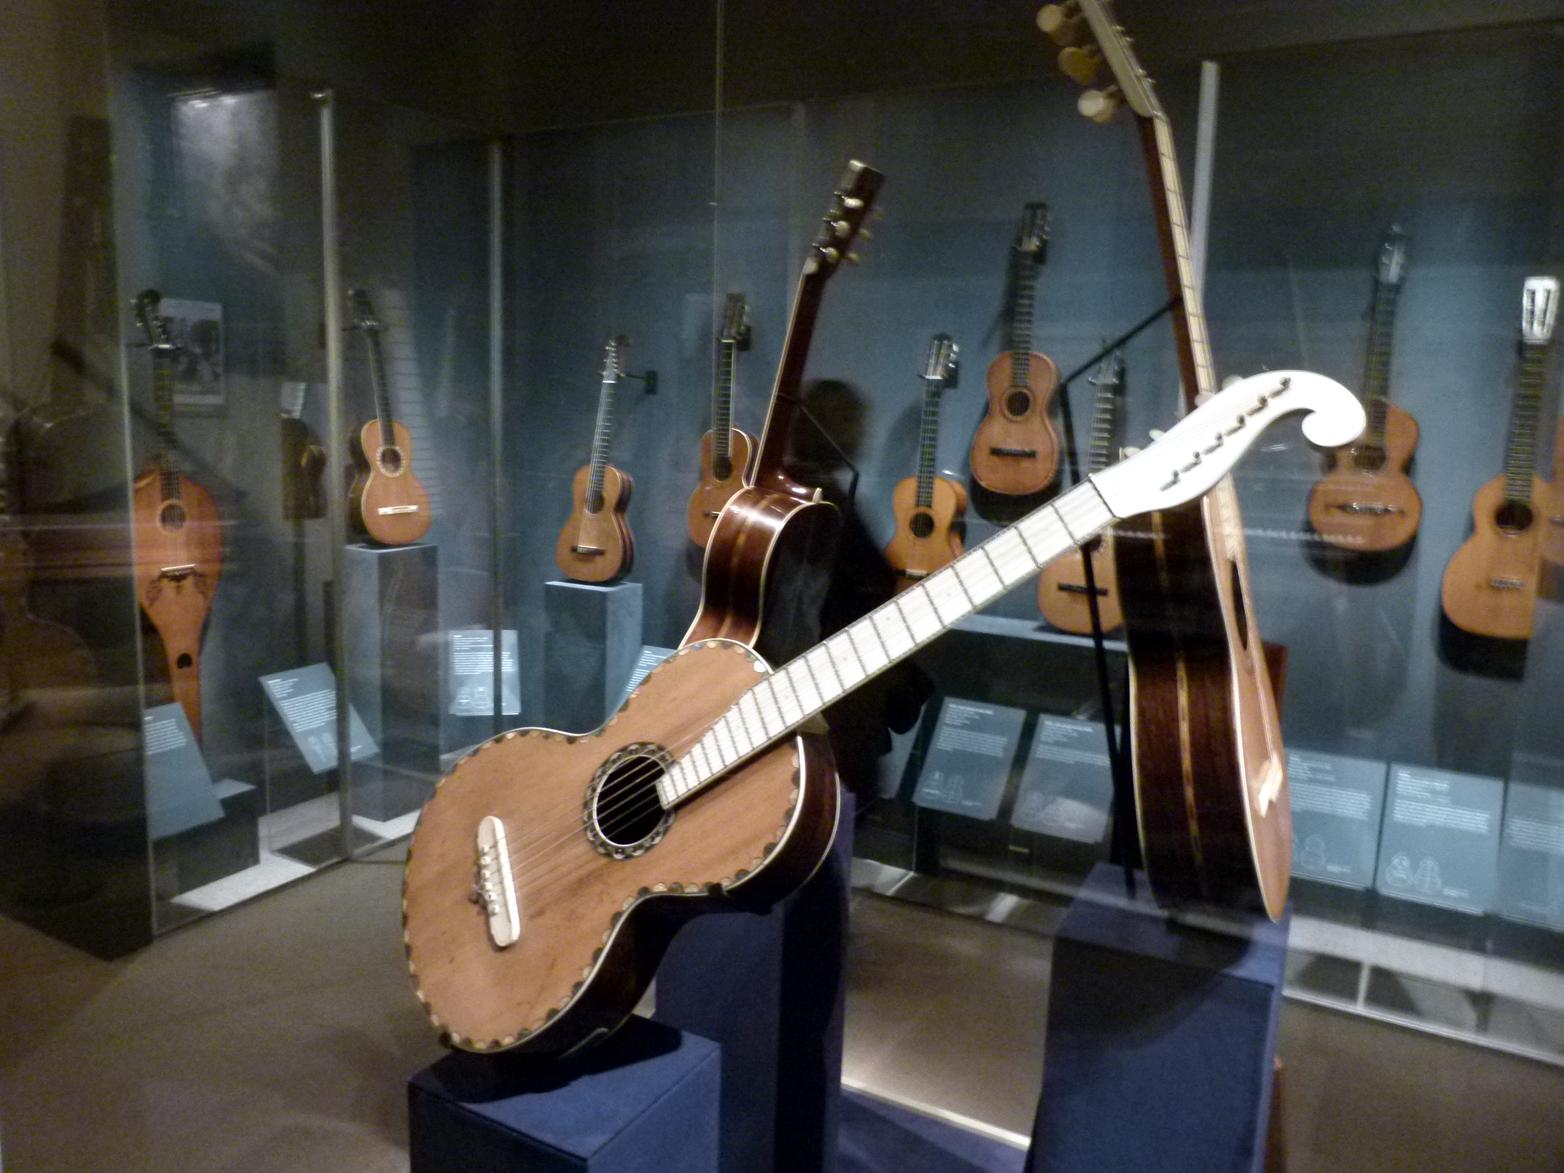 Guitarmuseumcom Guitar48938samickflyingvgreggbennettelectric